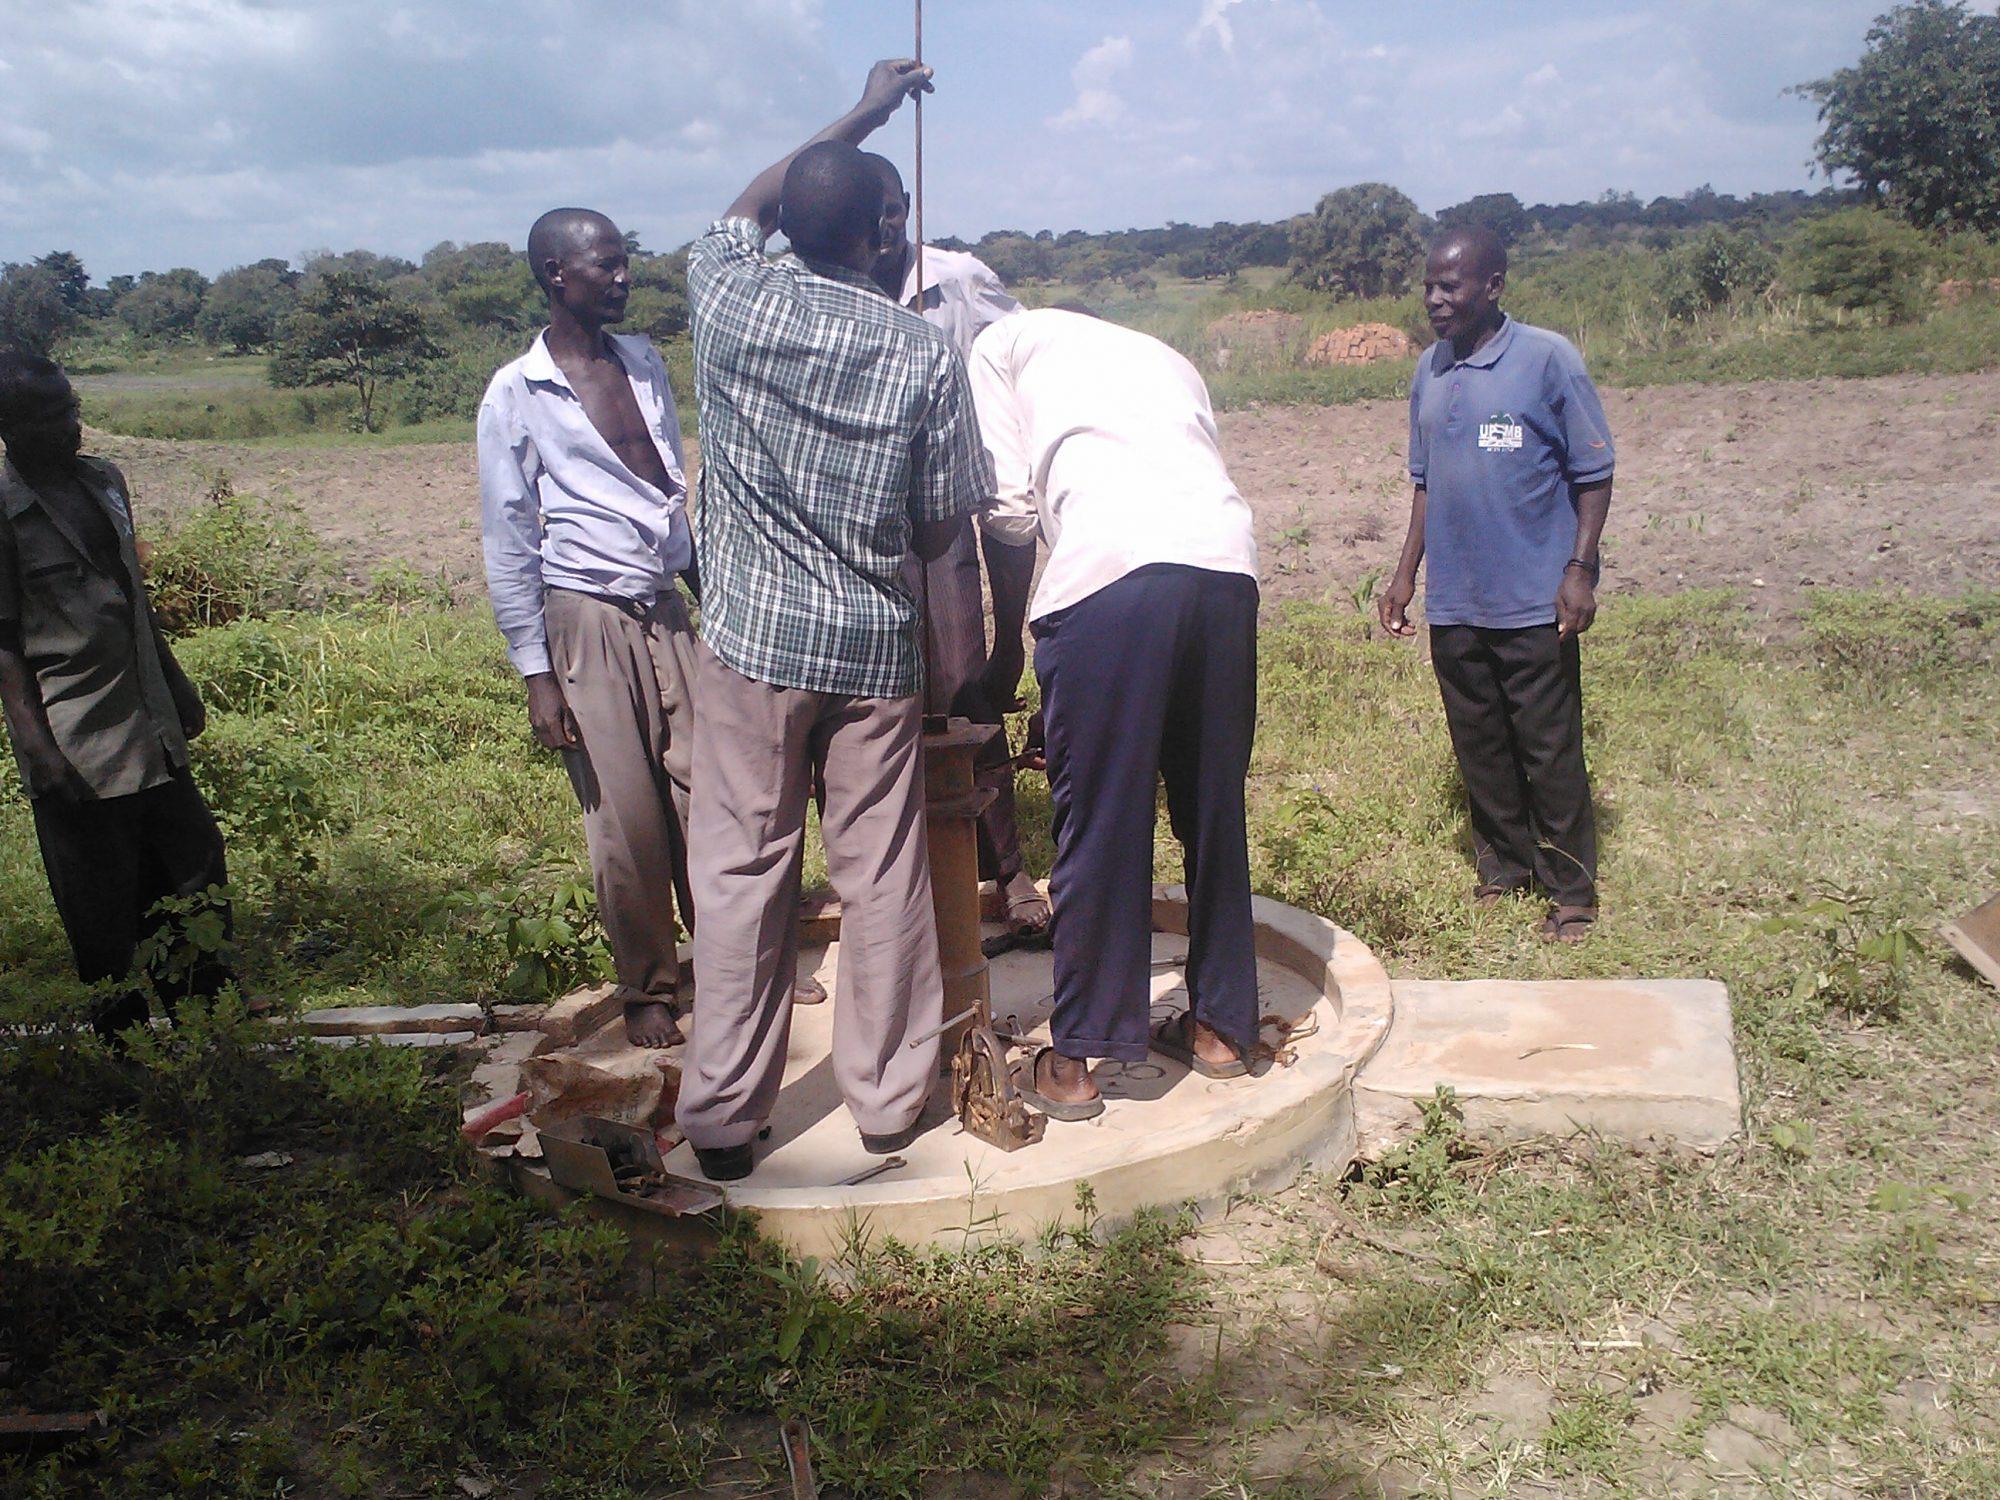 Local NGO partner WAACHA rehabilitating a borehole in Kaliro District